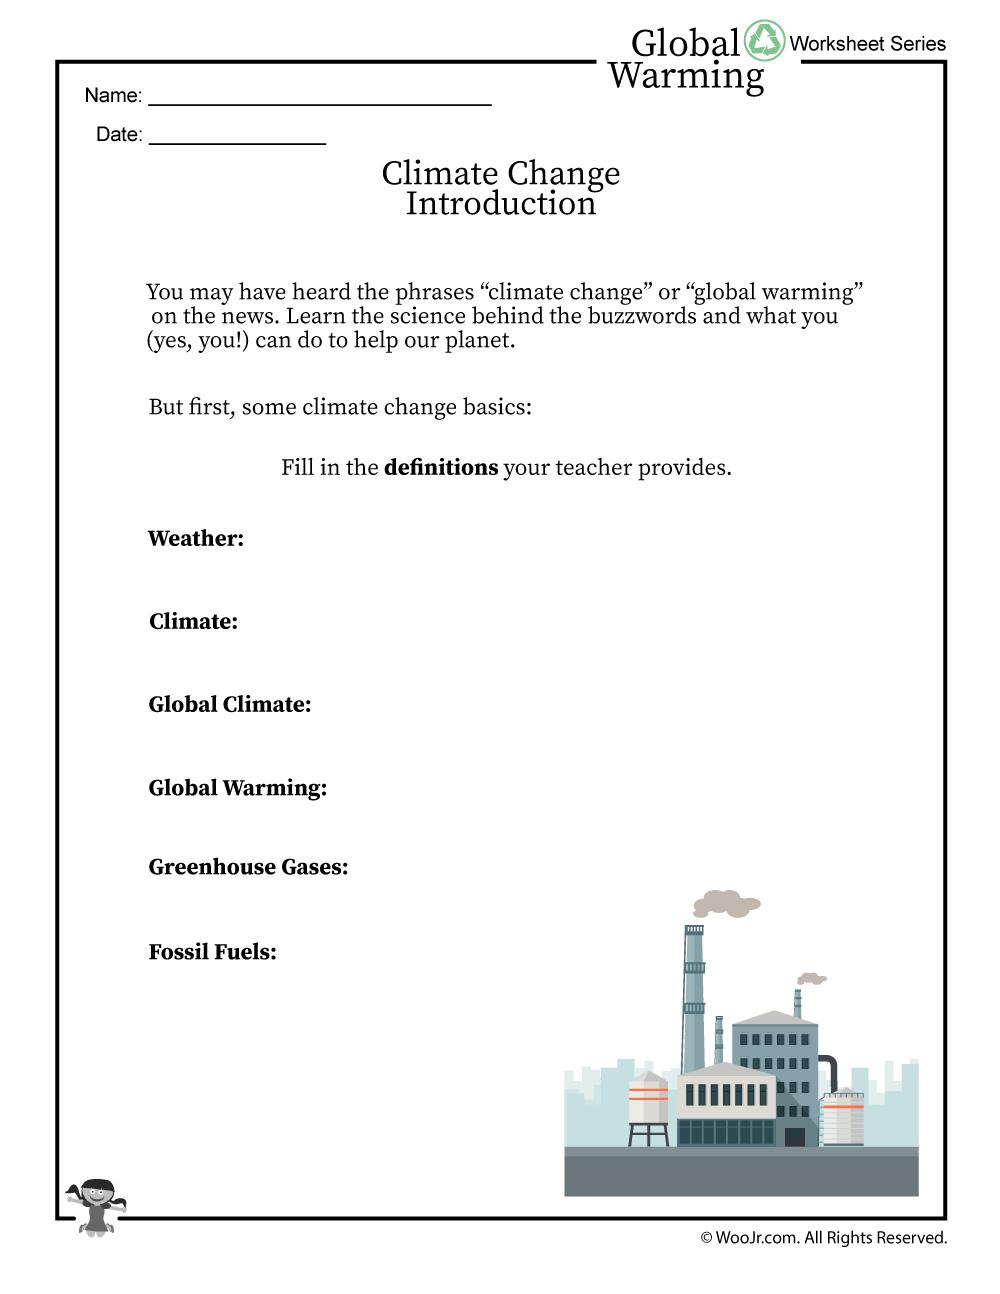 Climate Change Basics And Definitions Worksheet | Woo! Jr. Kids | Climate Change Printable Worksheets